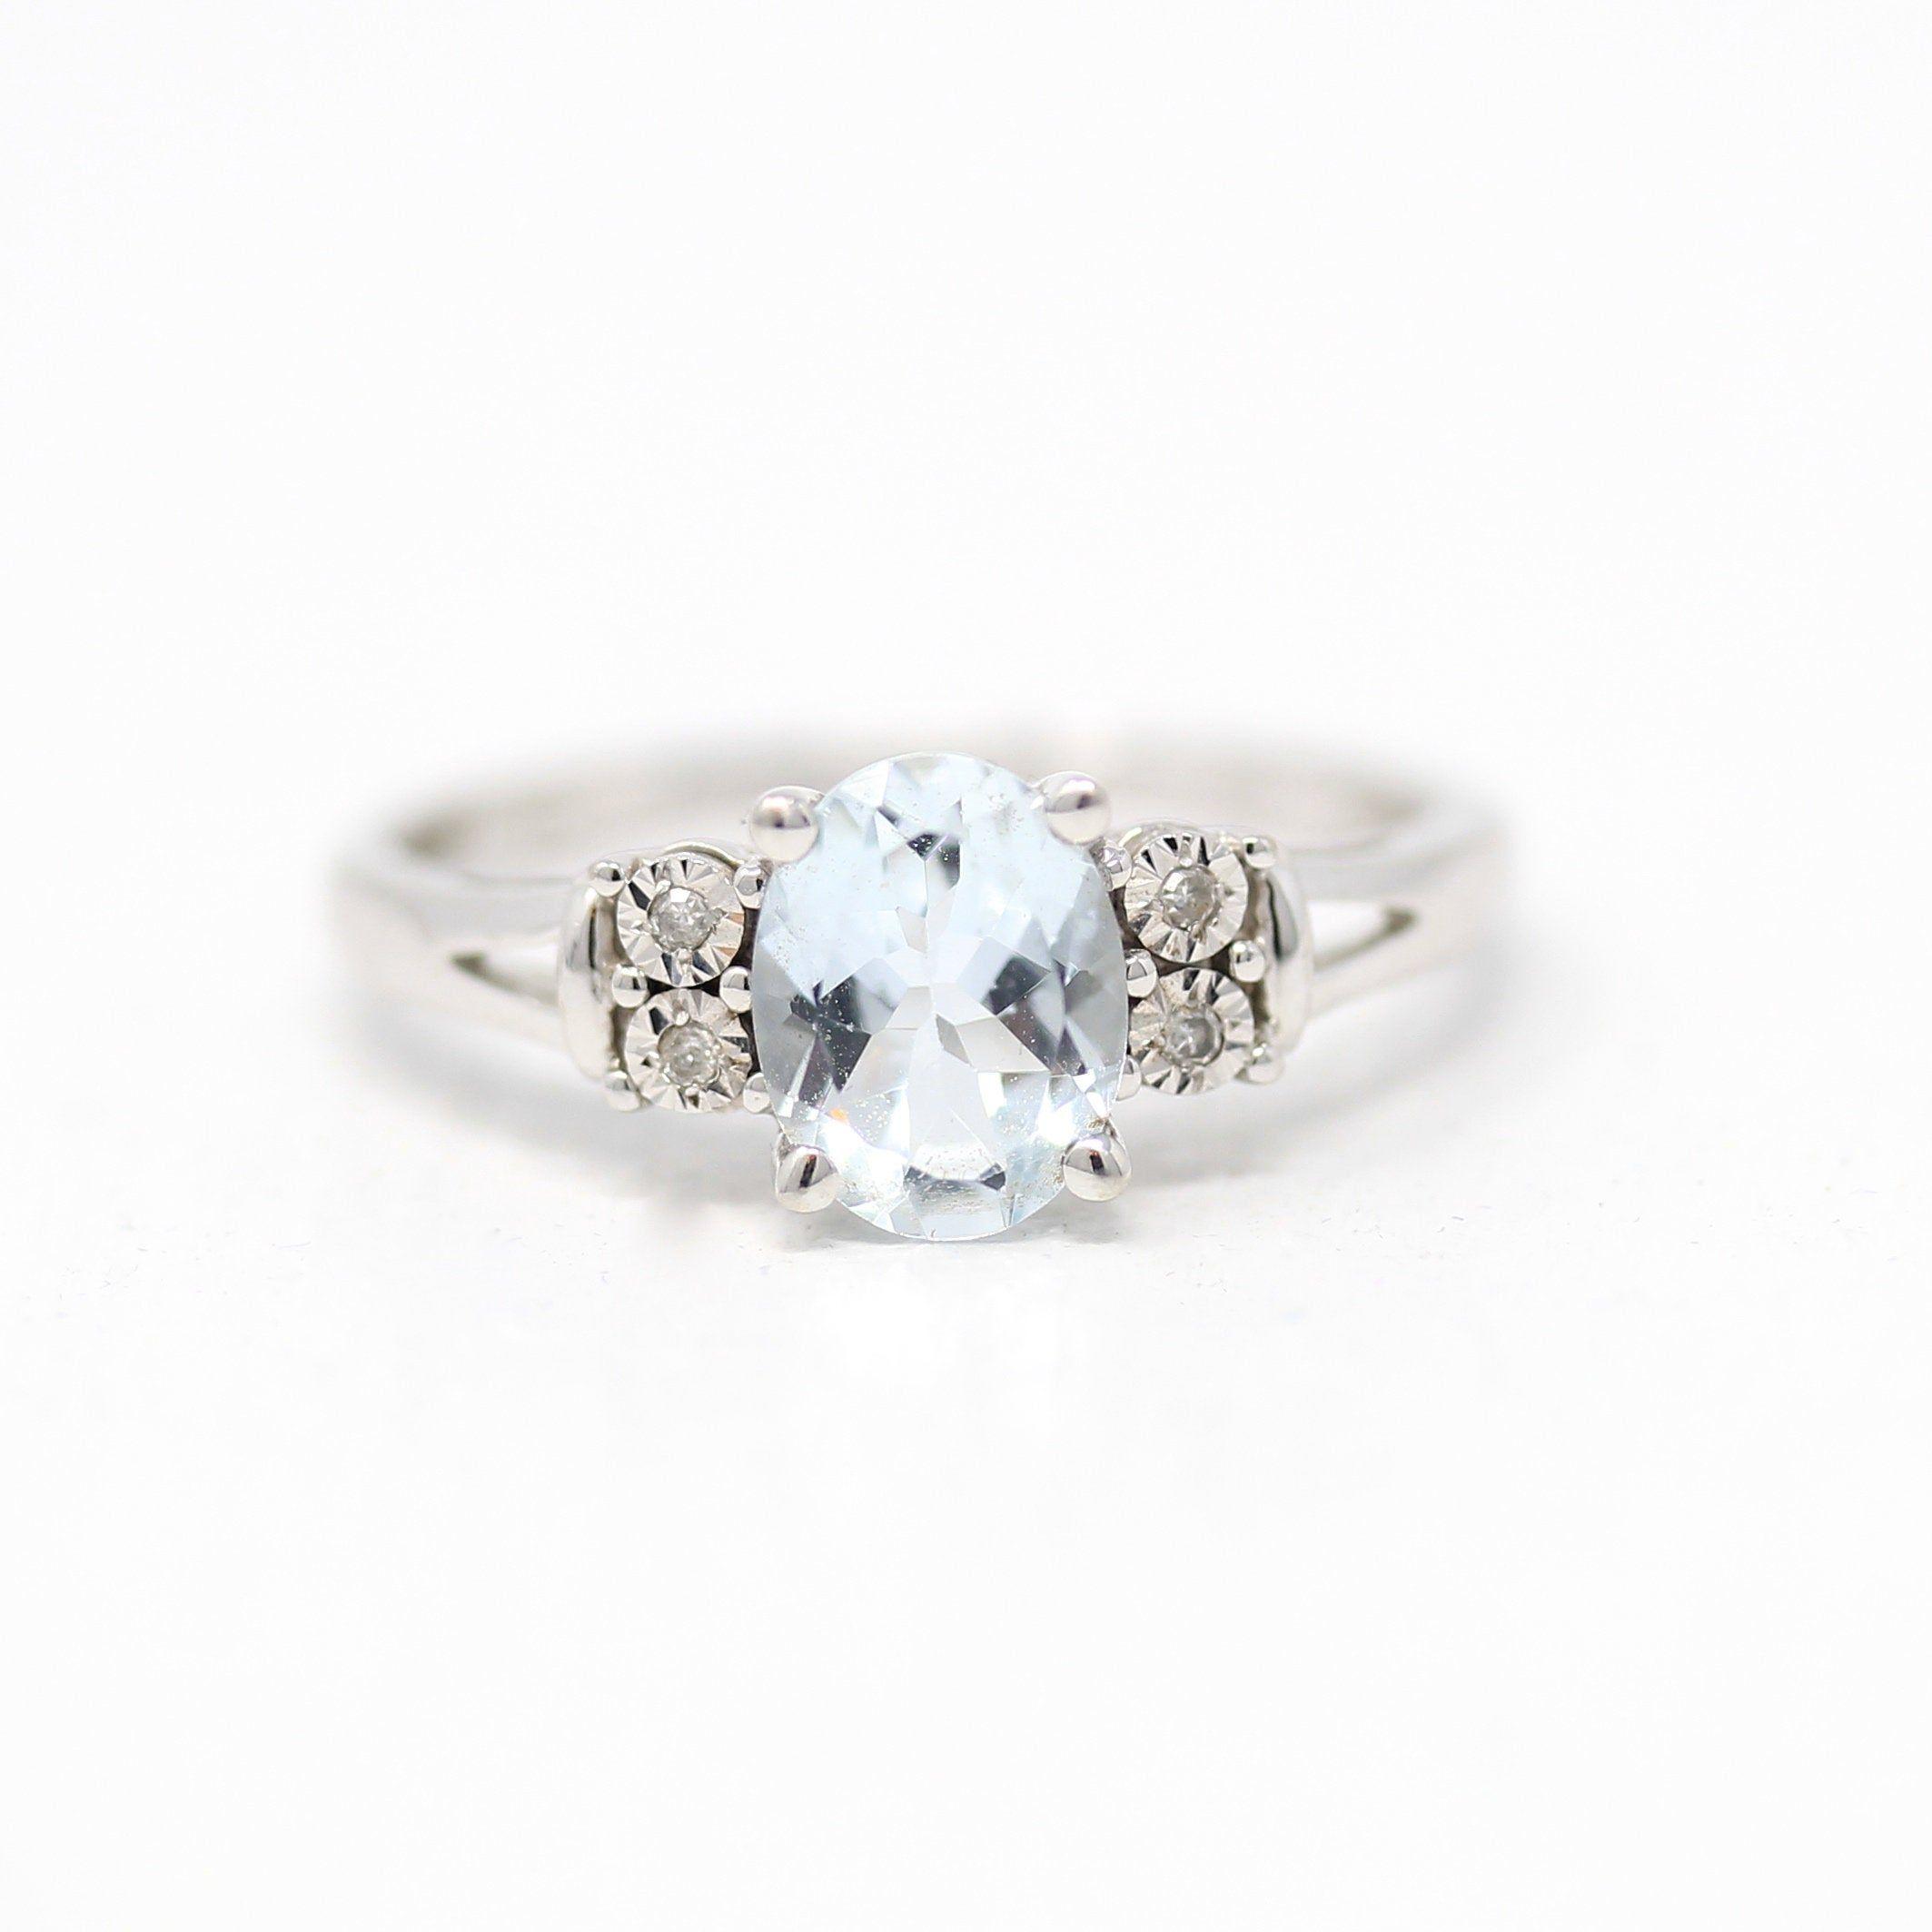 Estate Aquamarine Diamond Ring 10k White Gold Genuine 1 Carat Icy Light Blue Oval Gem Size 7 Vintage Gem March Birthstone Fine Jewelry In 2020 Diamond Ring March Birth Stone Diamond